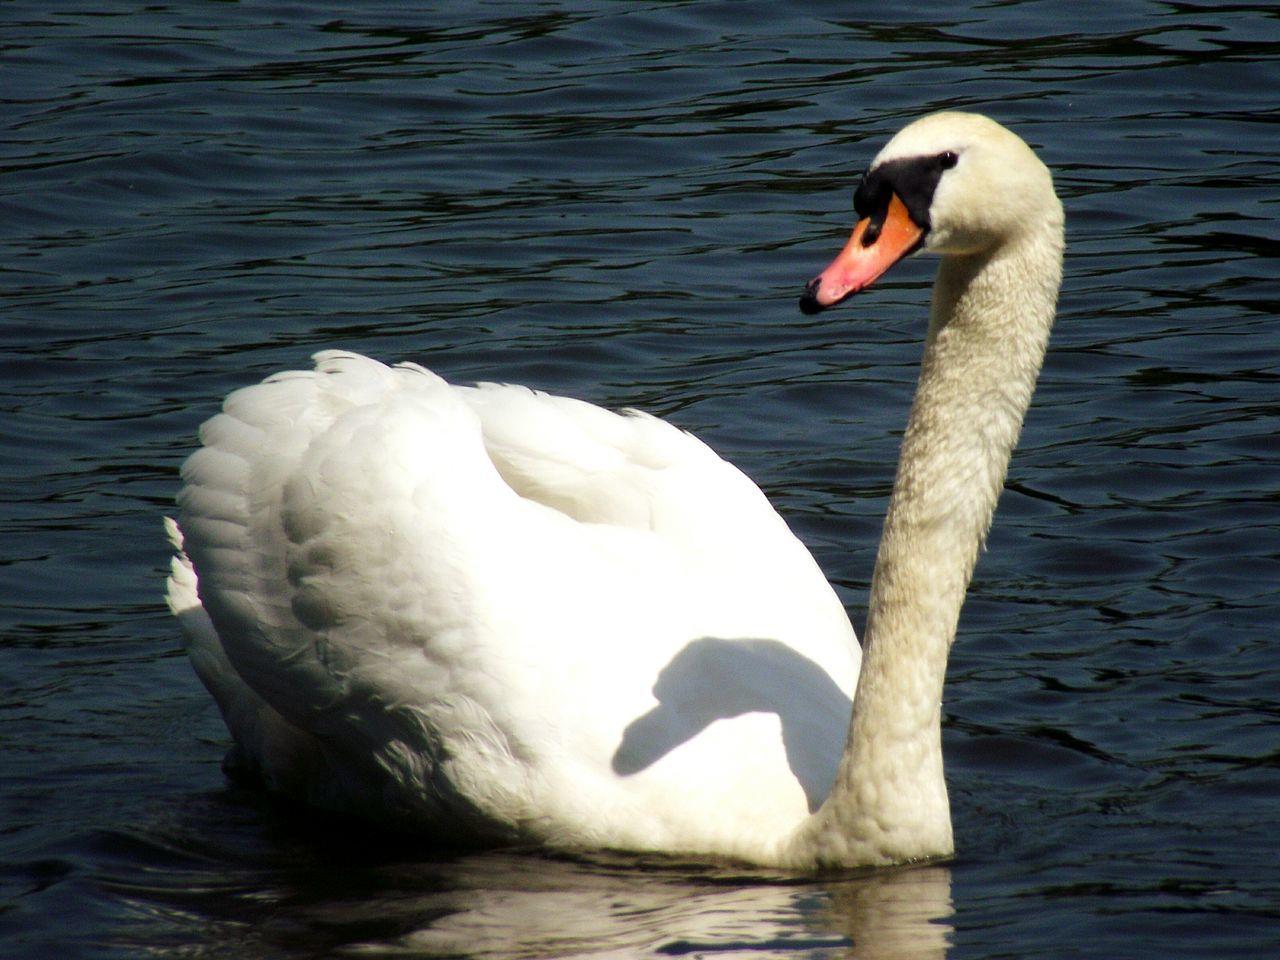 White Swan In Water